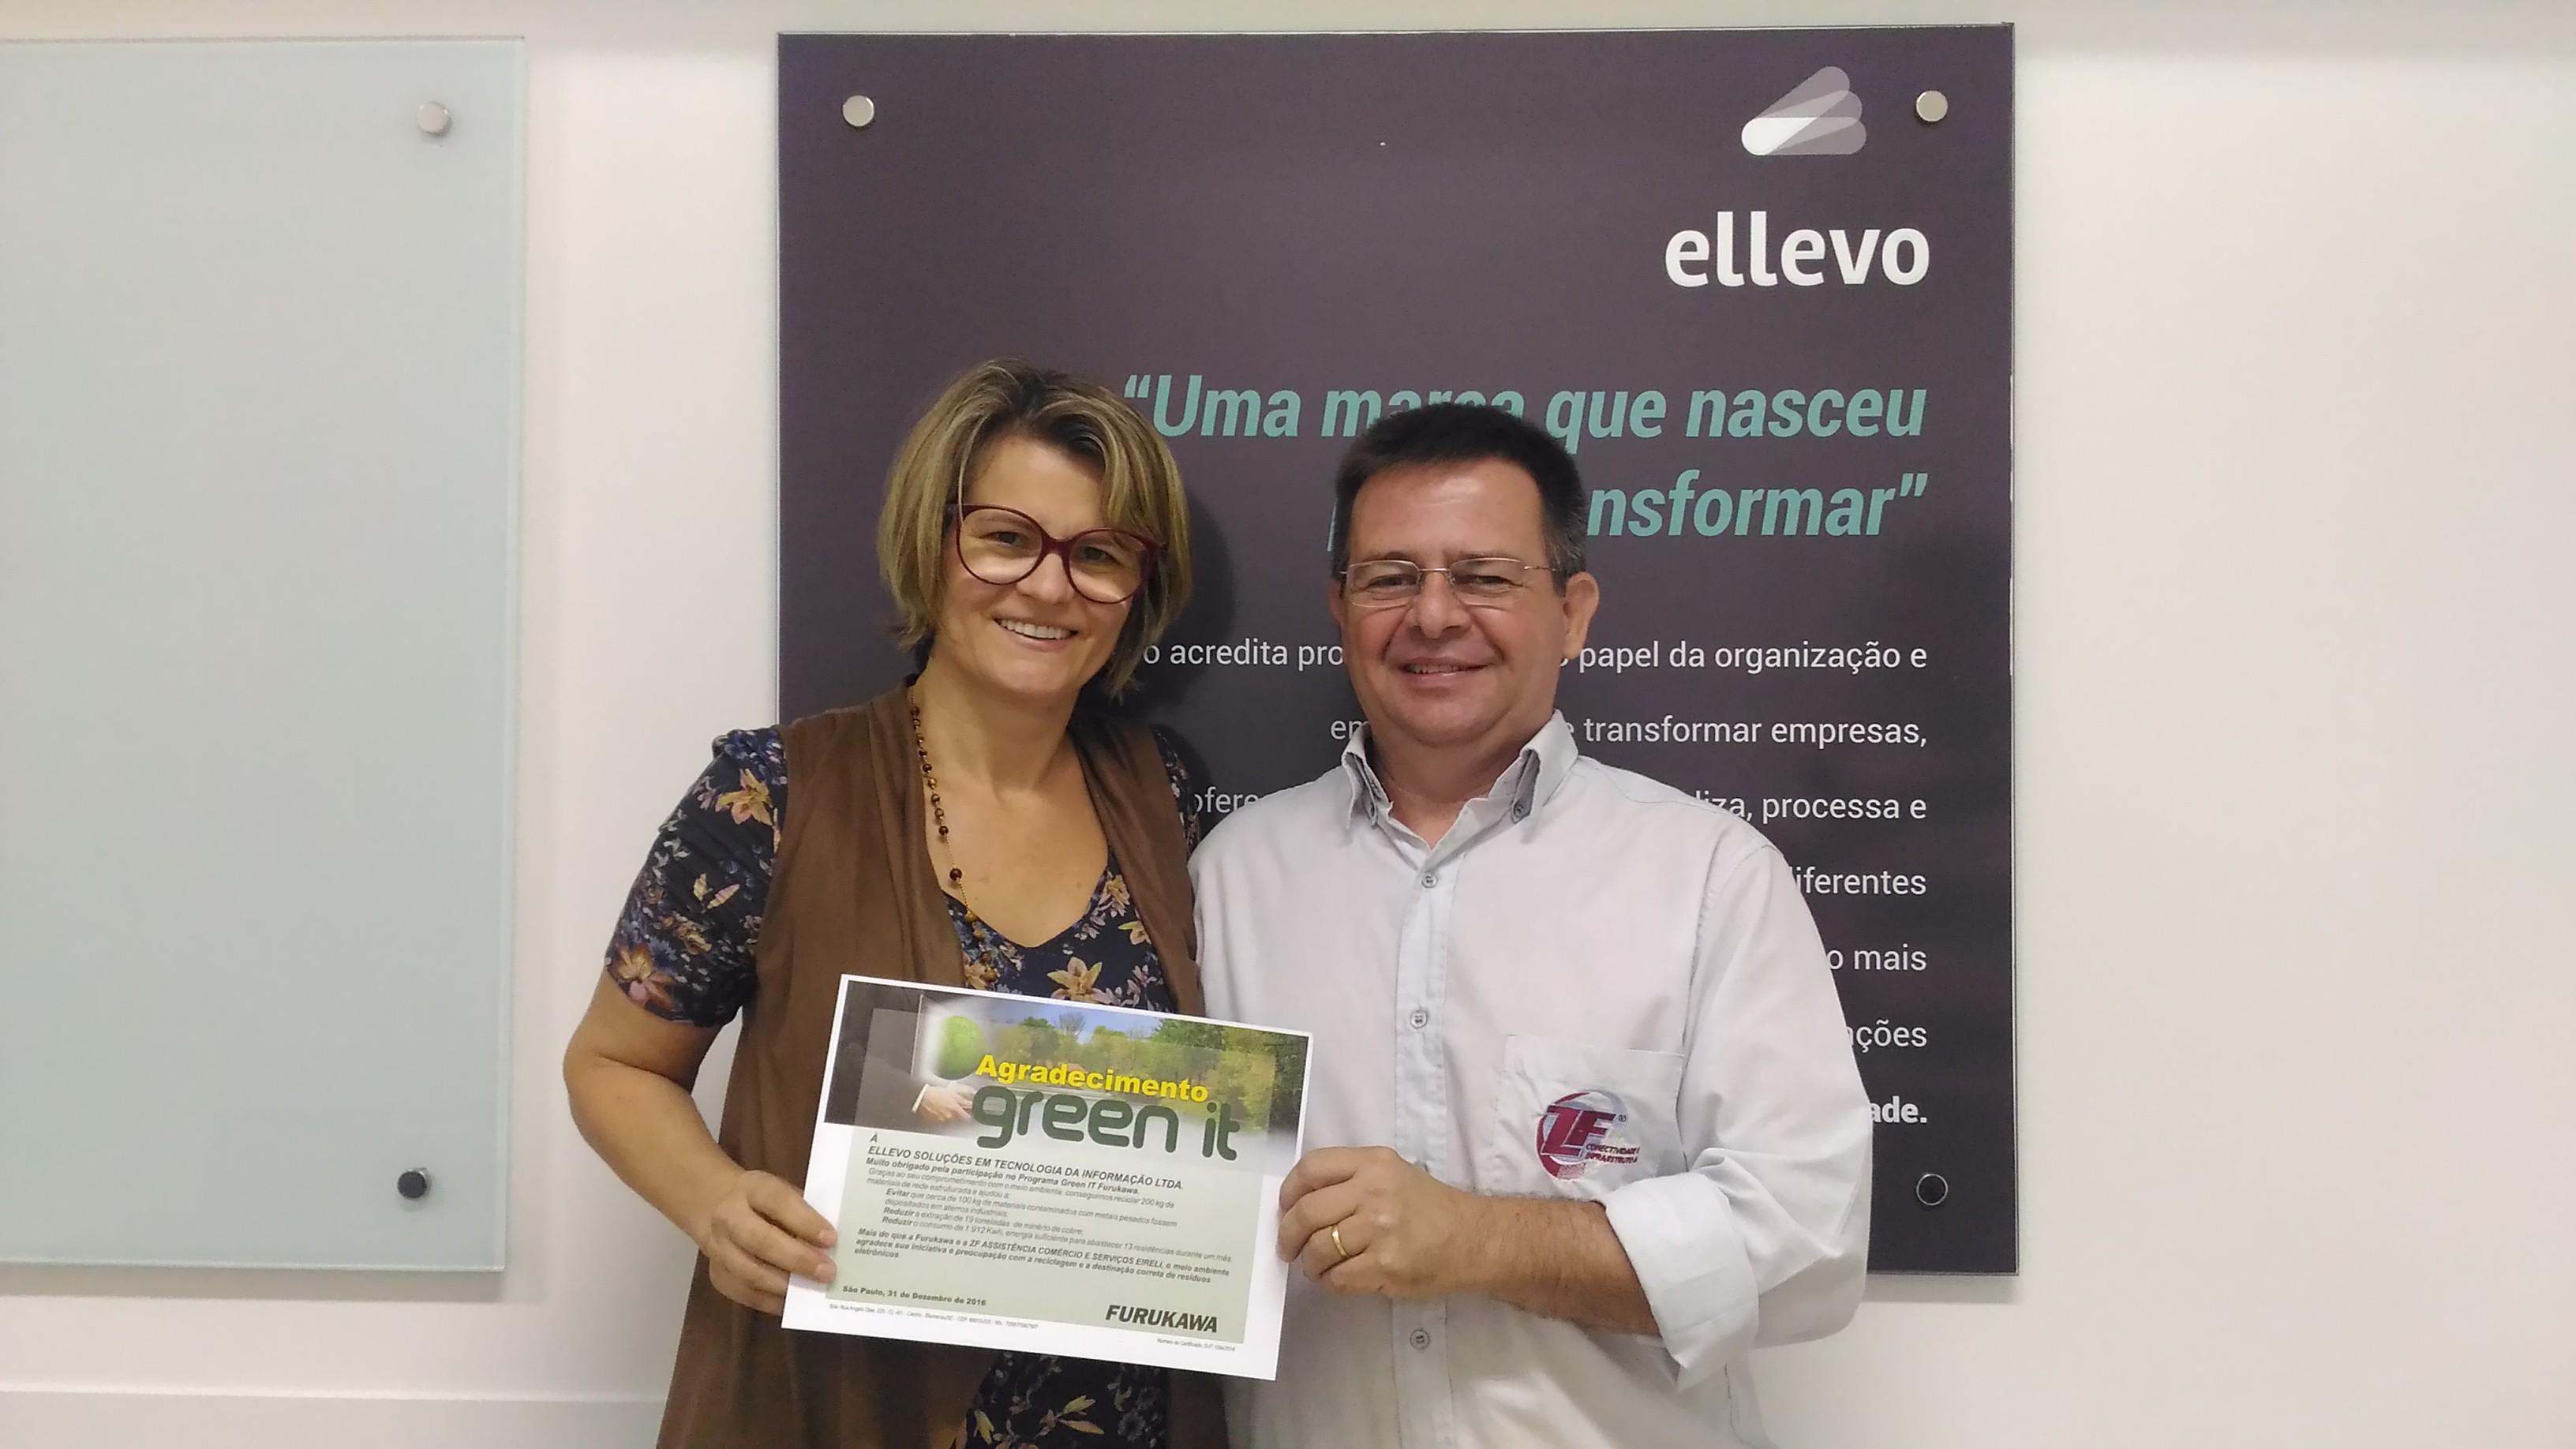 Ellevo recebe selo de sustentabilidade Green IT da global Furukawa